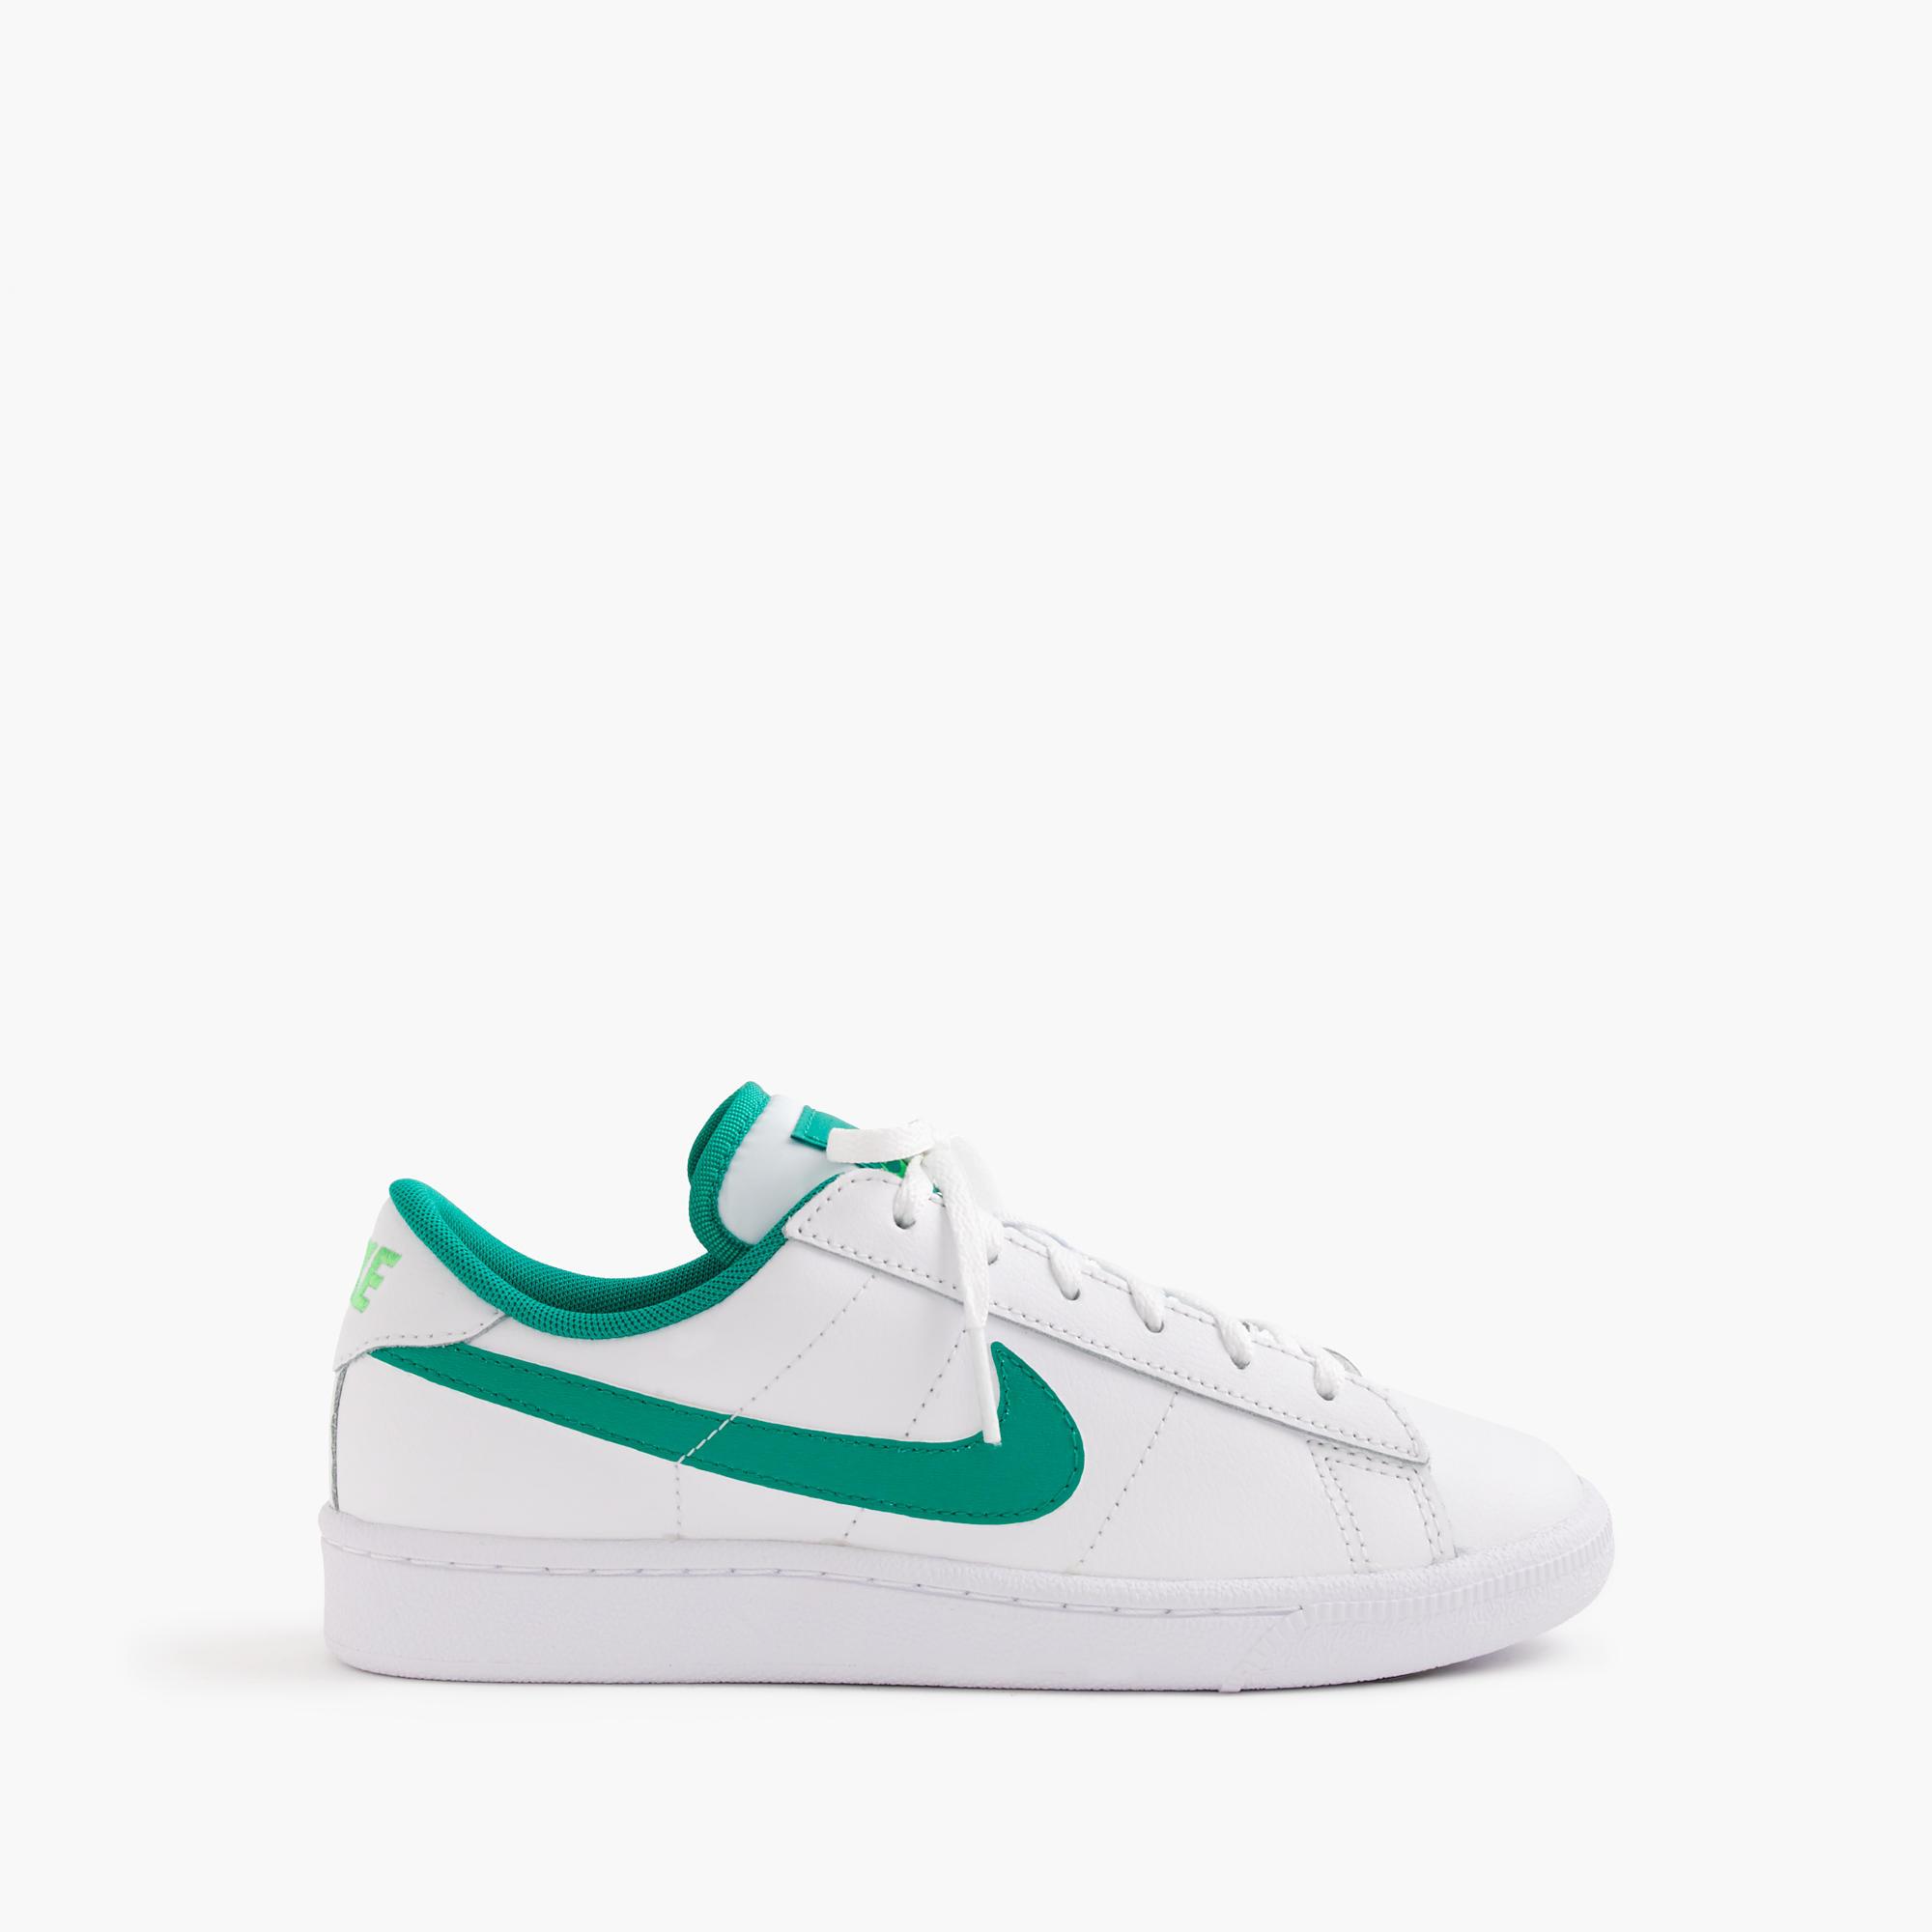 Kids nike tennis shoes